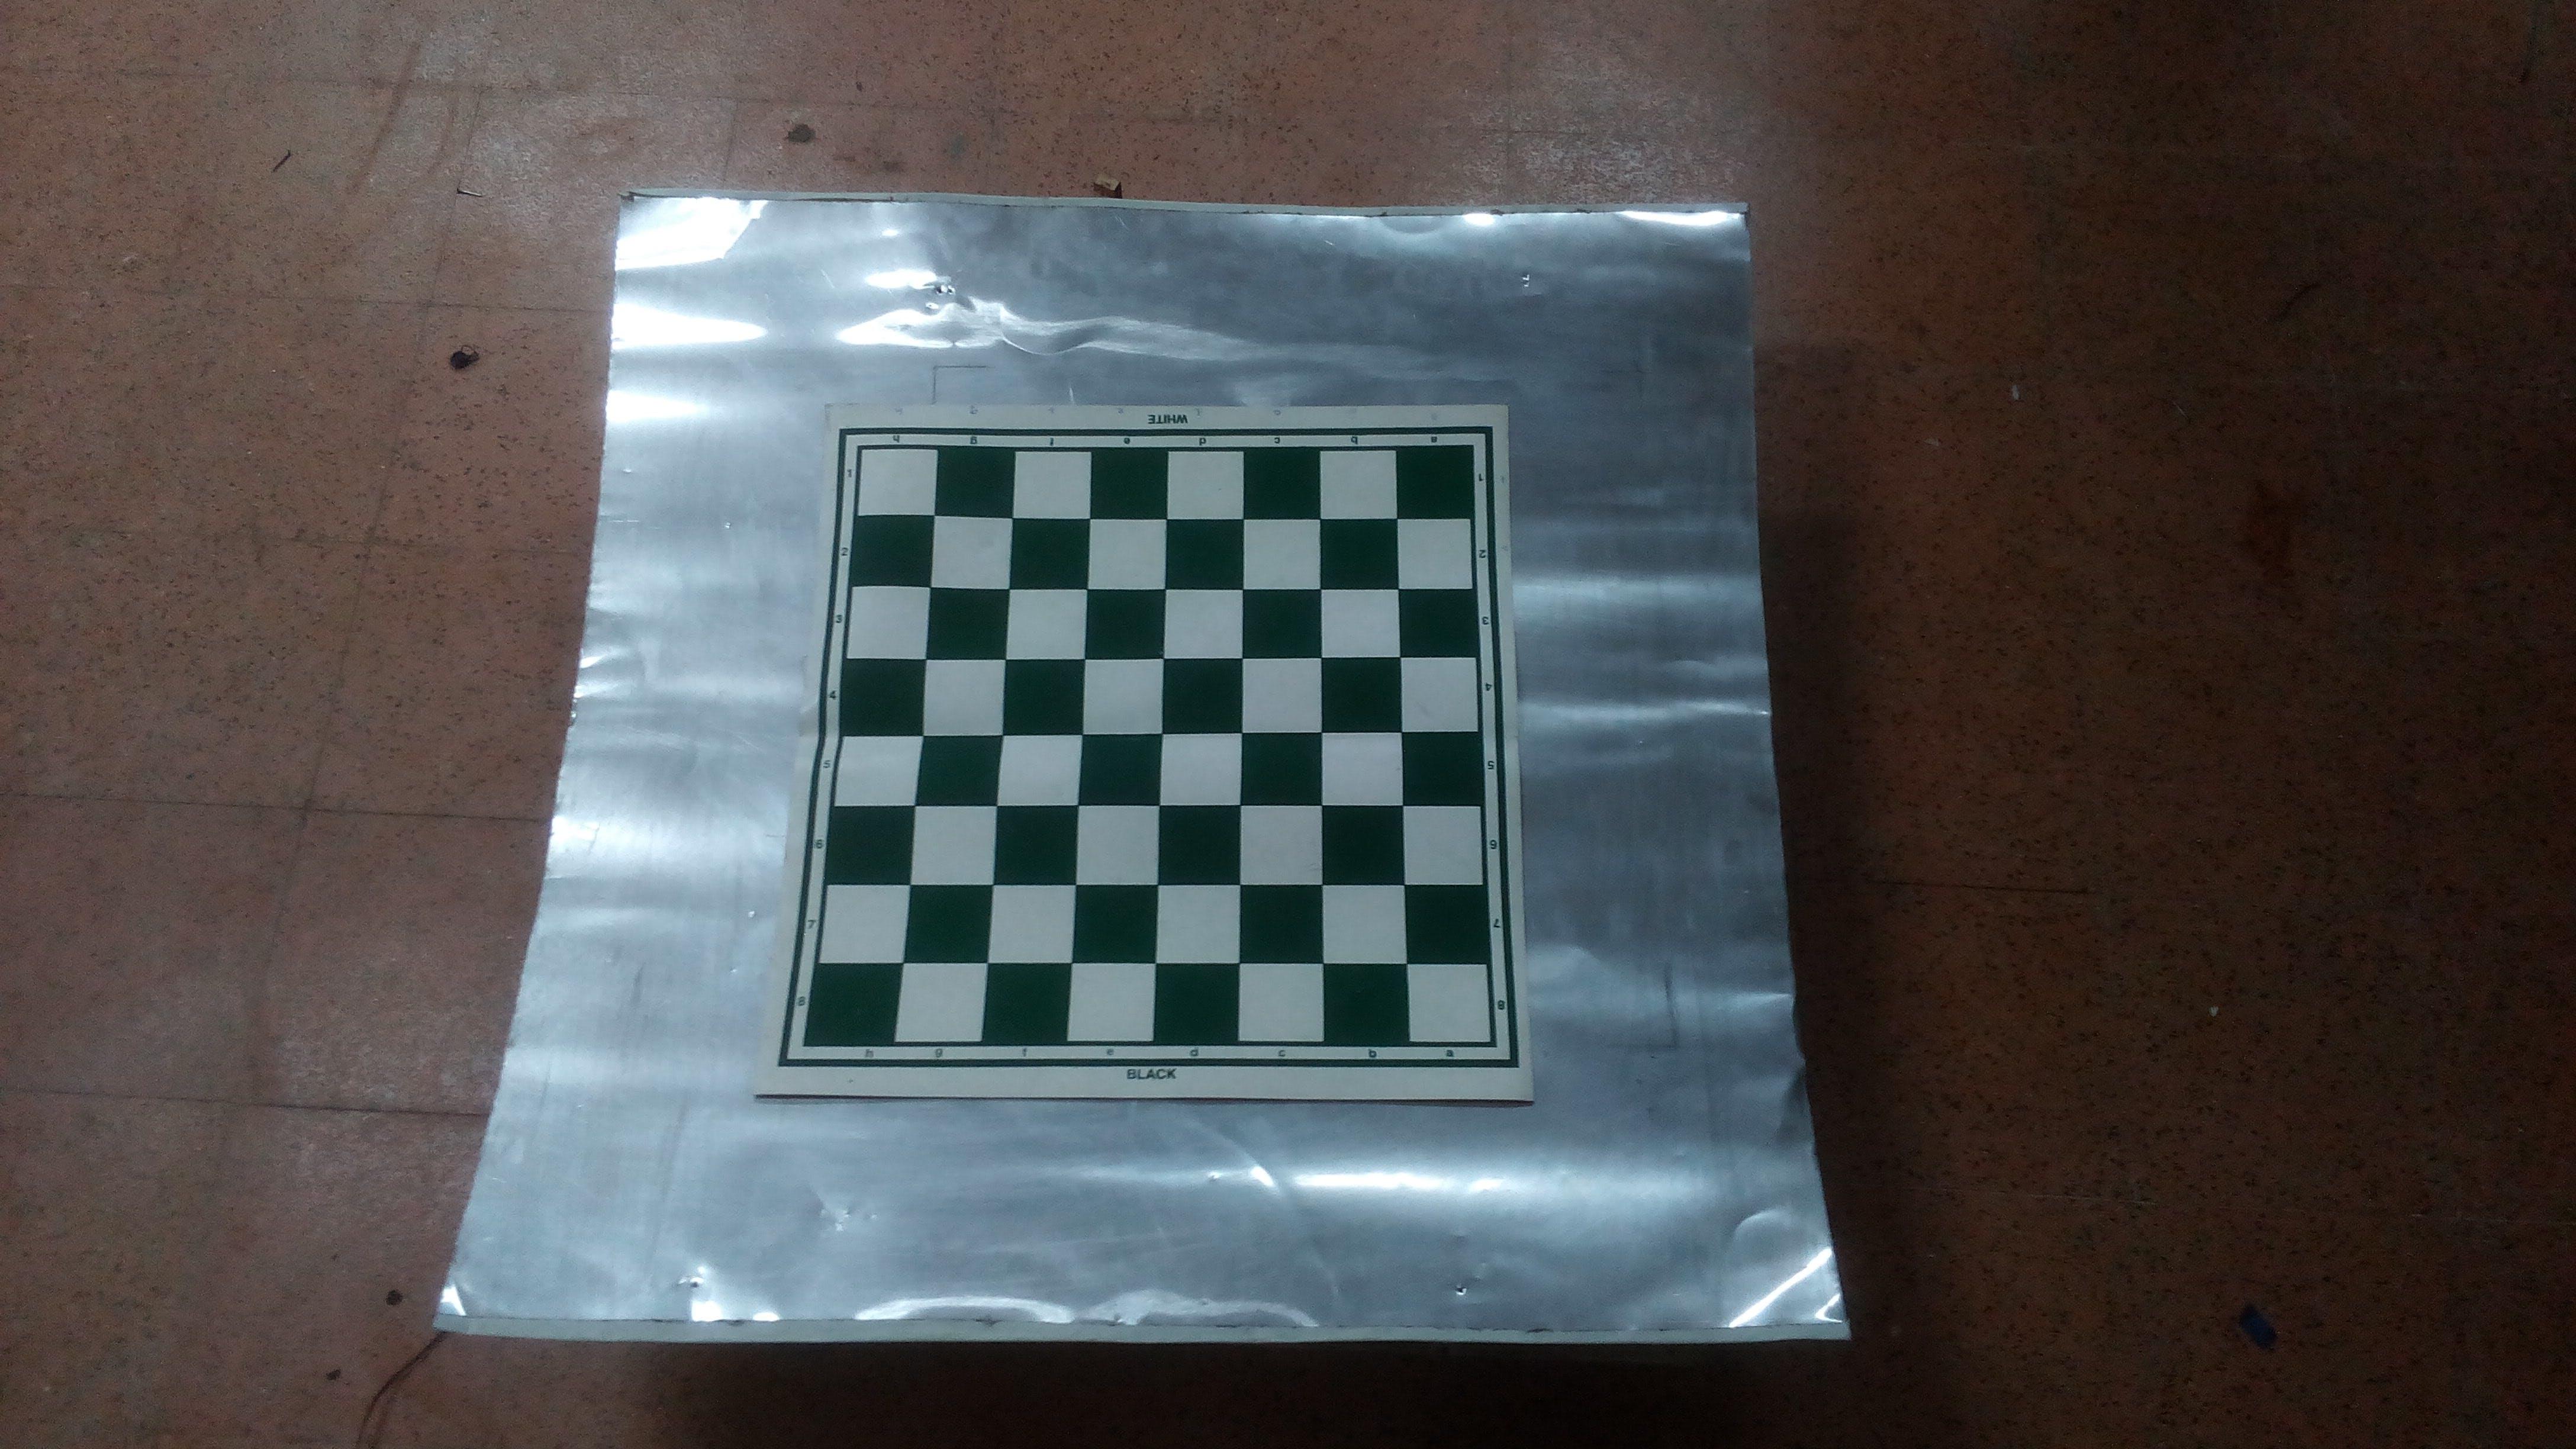 Aluminium Sheet and the chess sheet